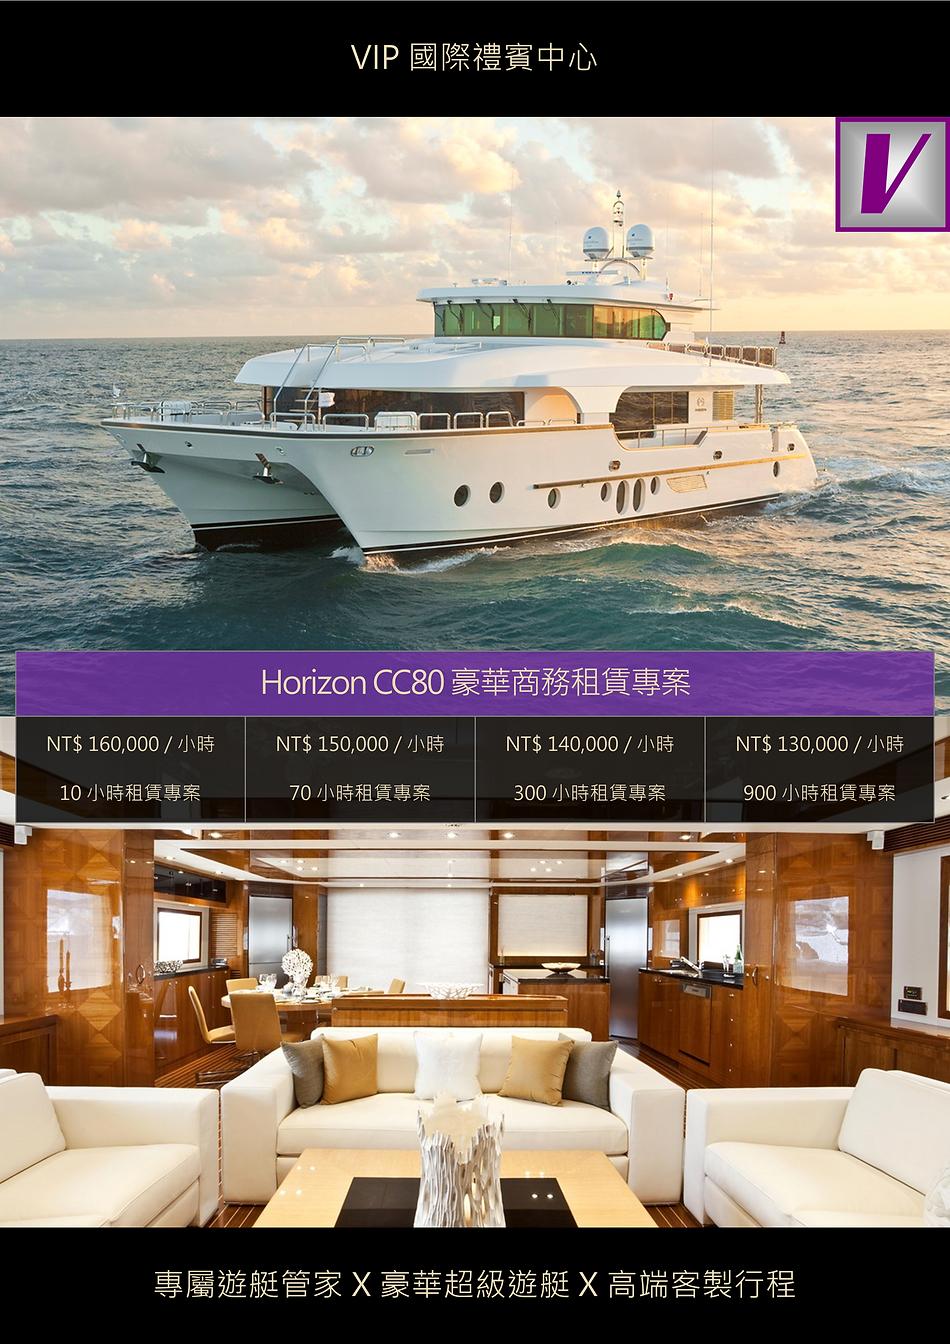 VIP國際禮賓中心 HORIZON CC80 豪華商務租賃專案 DM.png